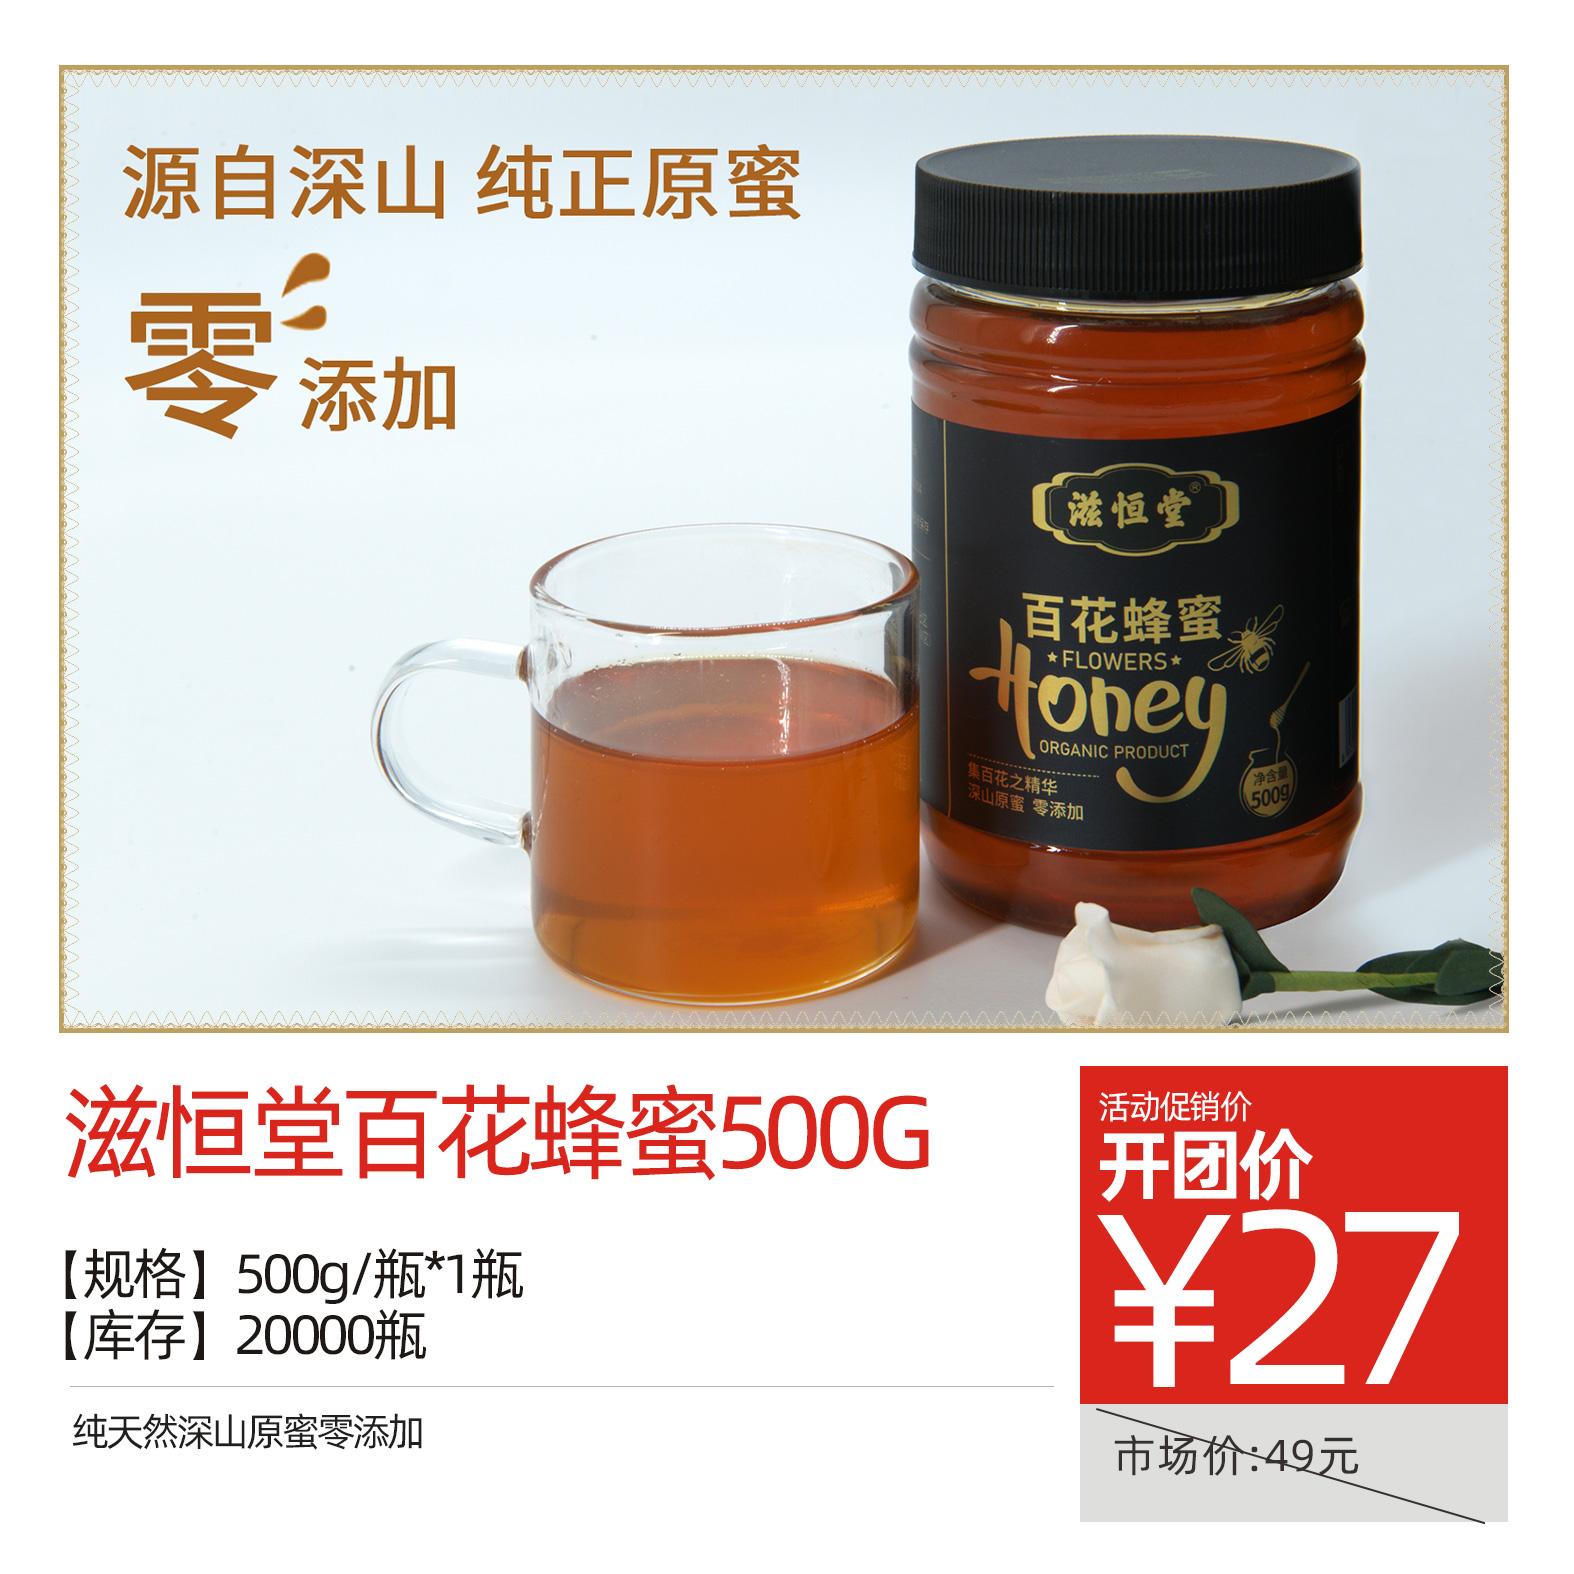 滋恒堂百花蜂蜜500g*1瓶